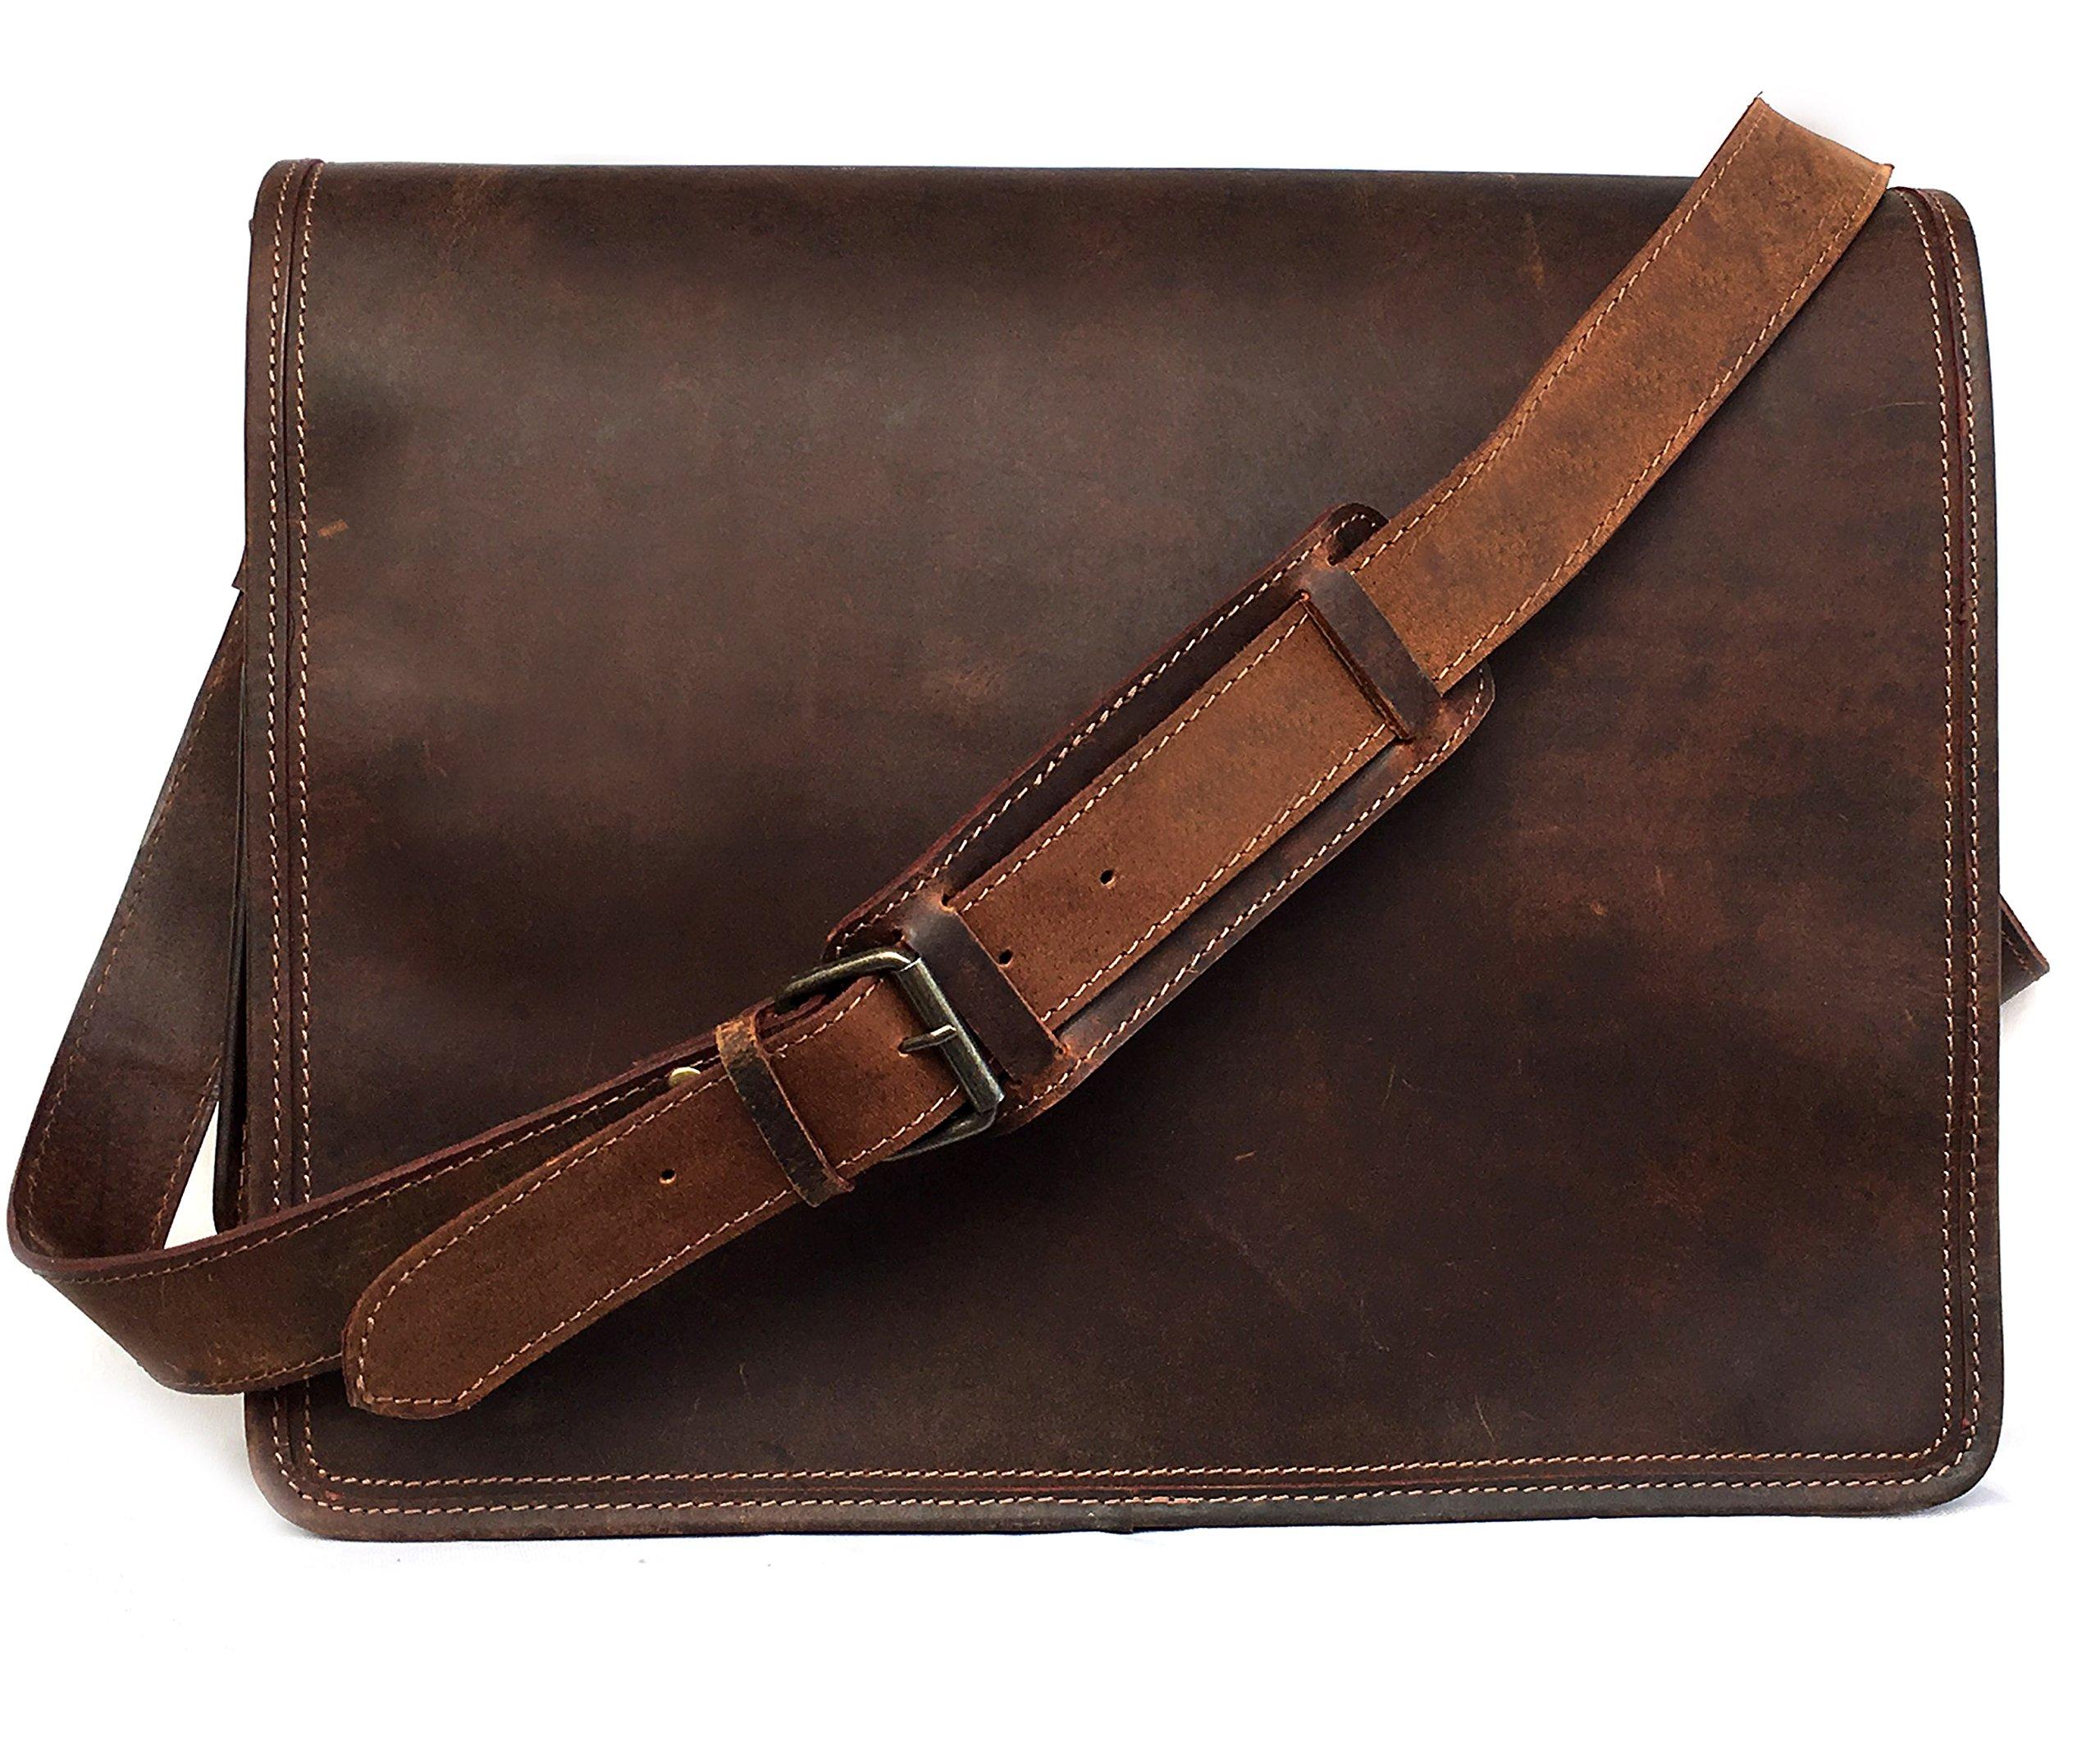 16 Inch Leather Vintage Rustic Crossbody Messenger Courier Satchel Bag Gift Men Women ~ Business Work Briefcase Carry Laptop Computer Book Handmade Rugged & Distressed By KK's Leather by kk's leather (Image #3)